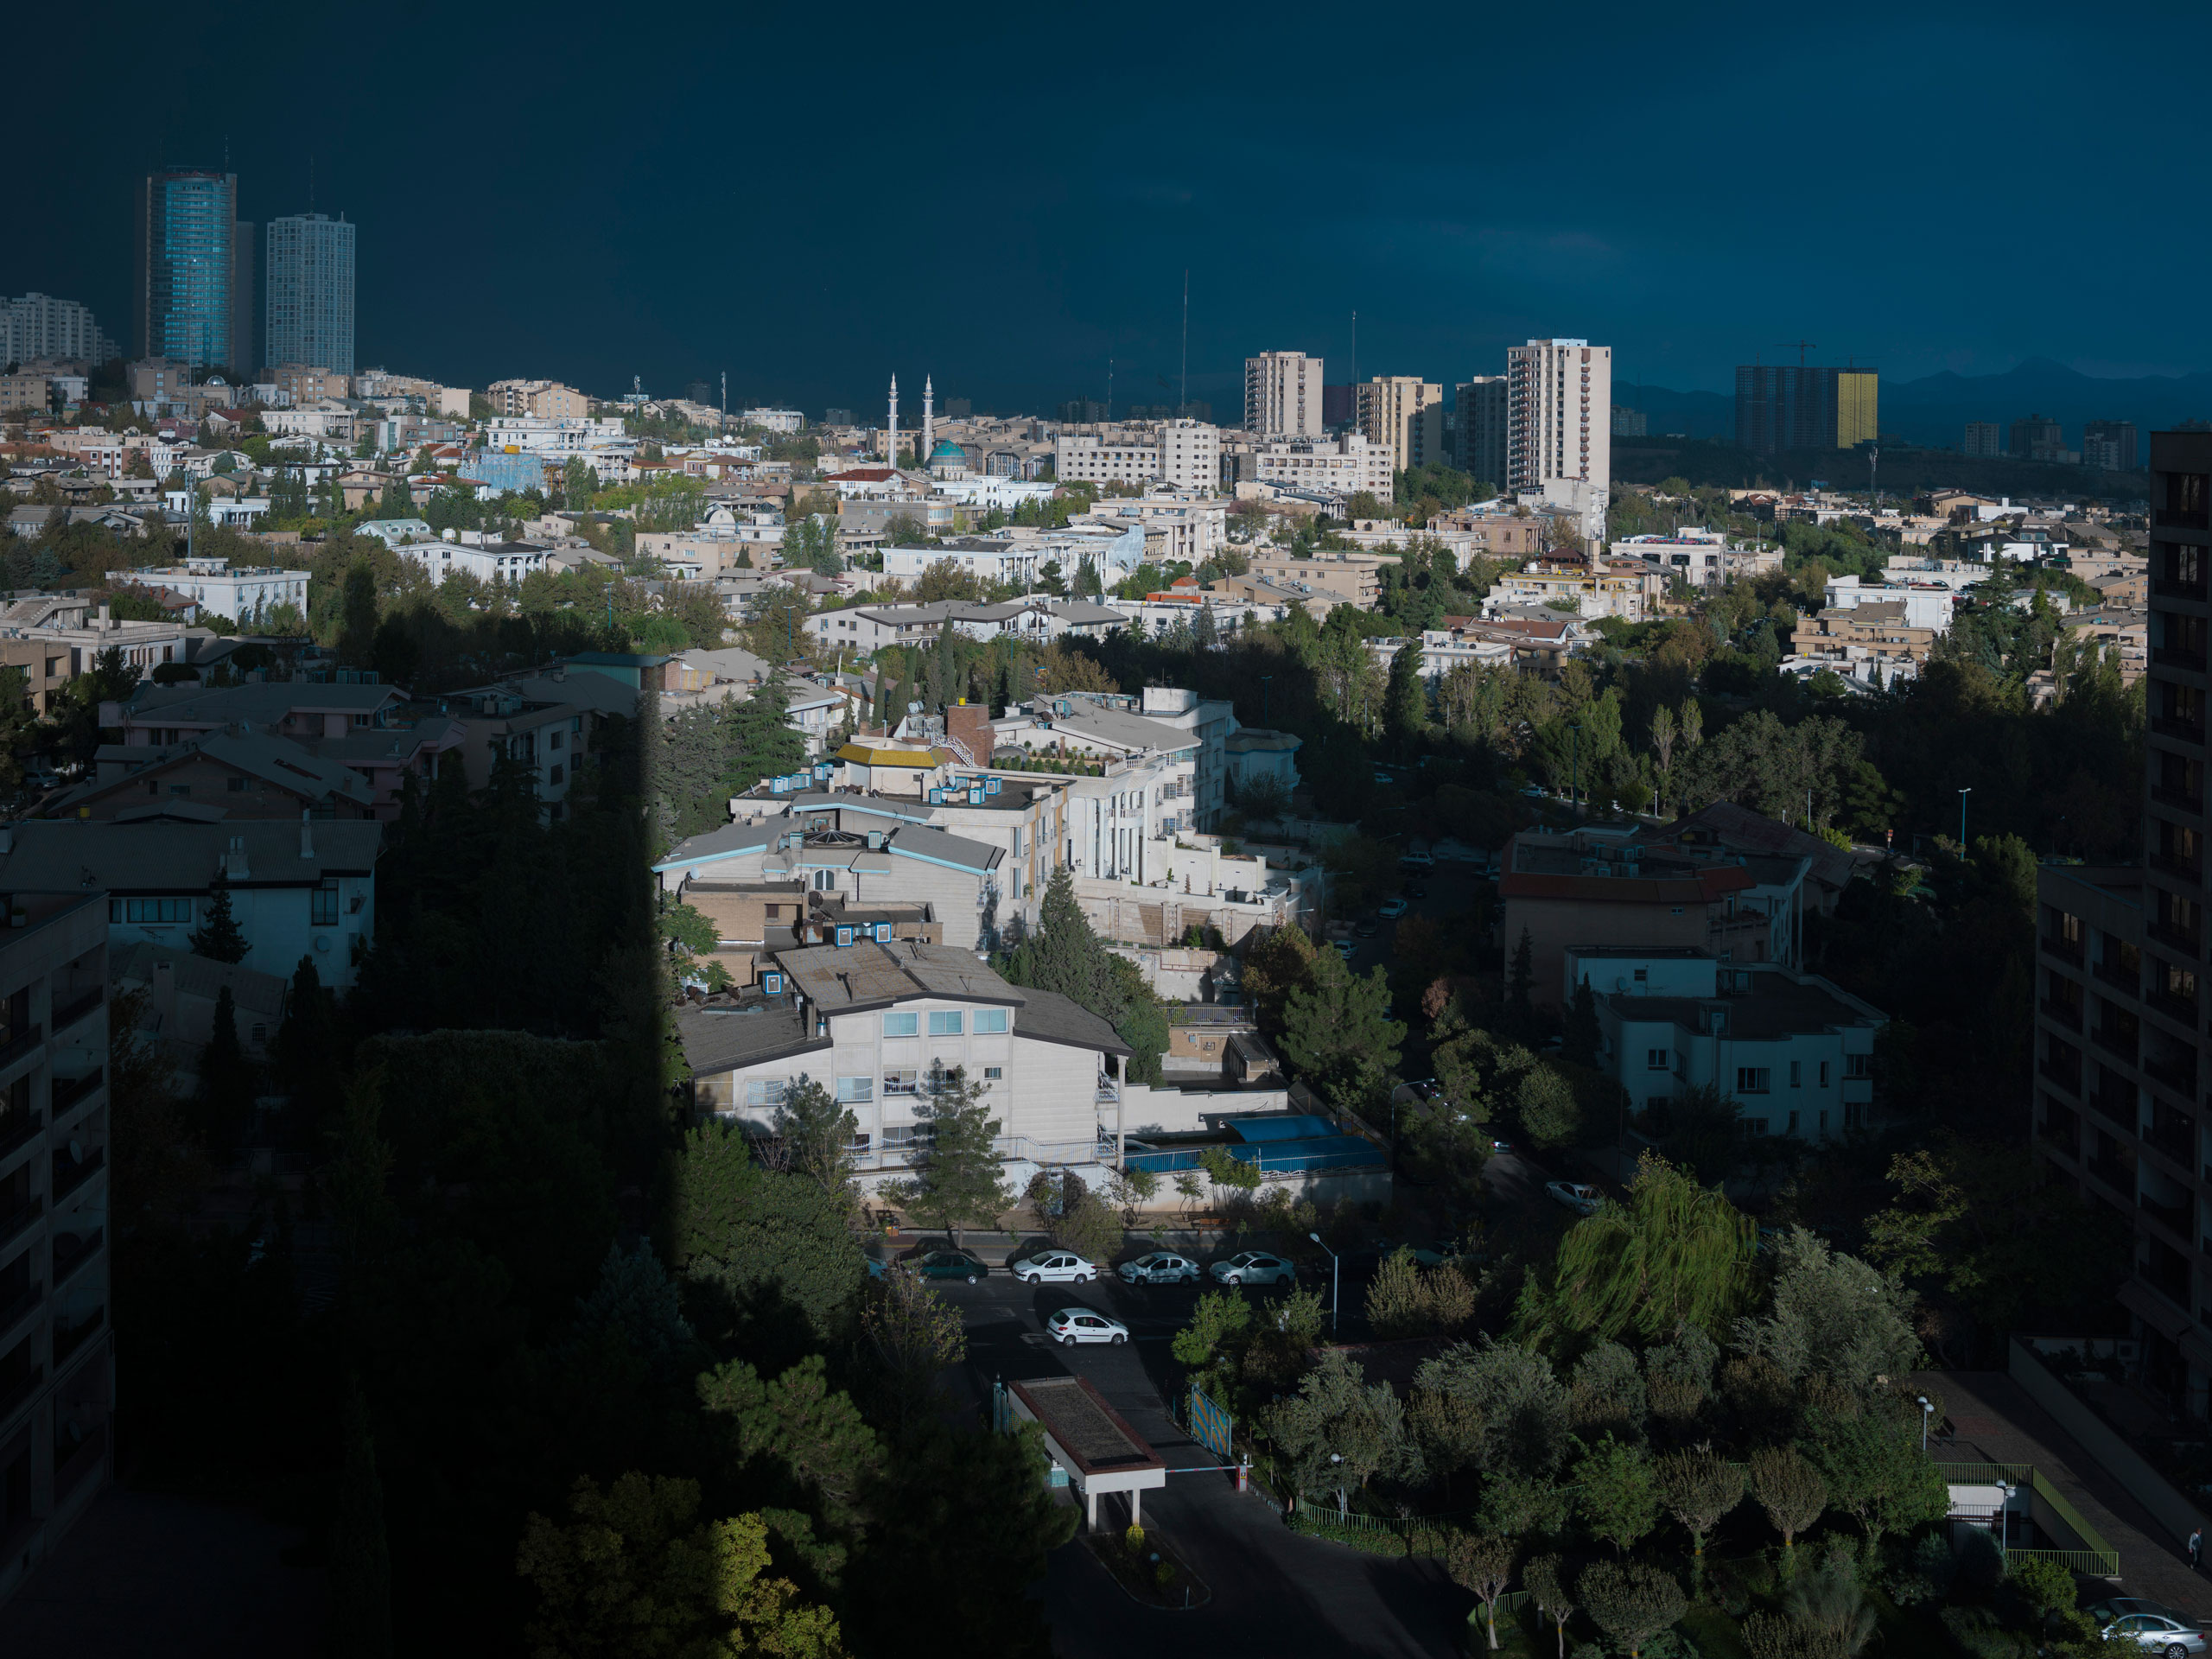 View of the Shahrak-e Gharb neighborhood, in the modern Tehran west side.